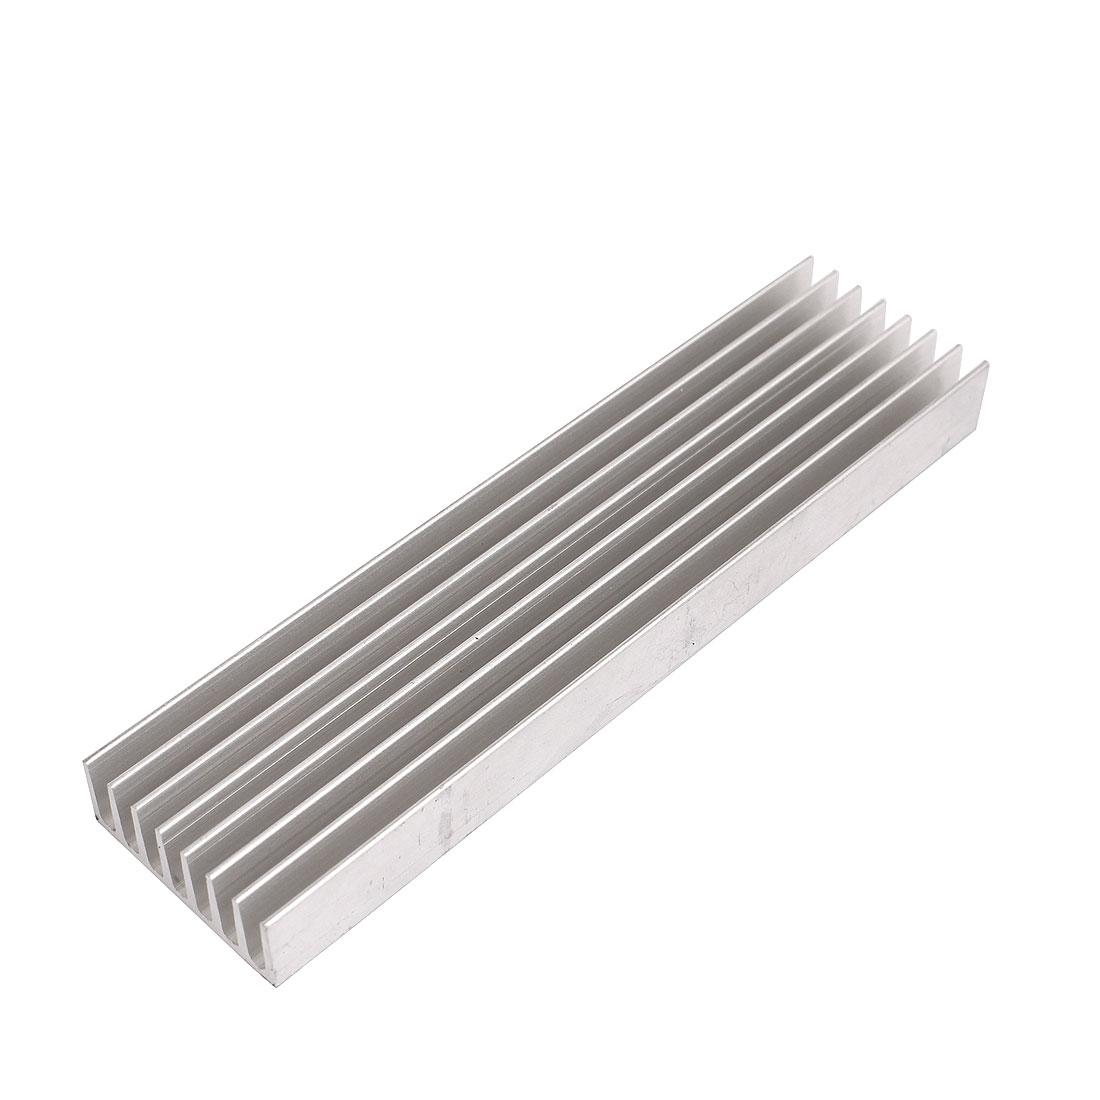 Aluminum 110mm x 18mm x 10mm Heat Sink Heatsink for LED Power IC Transistor